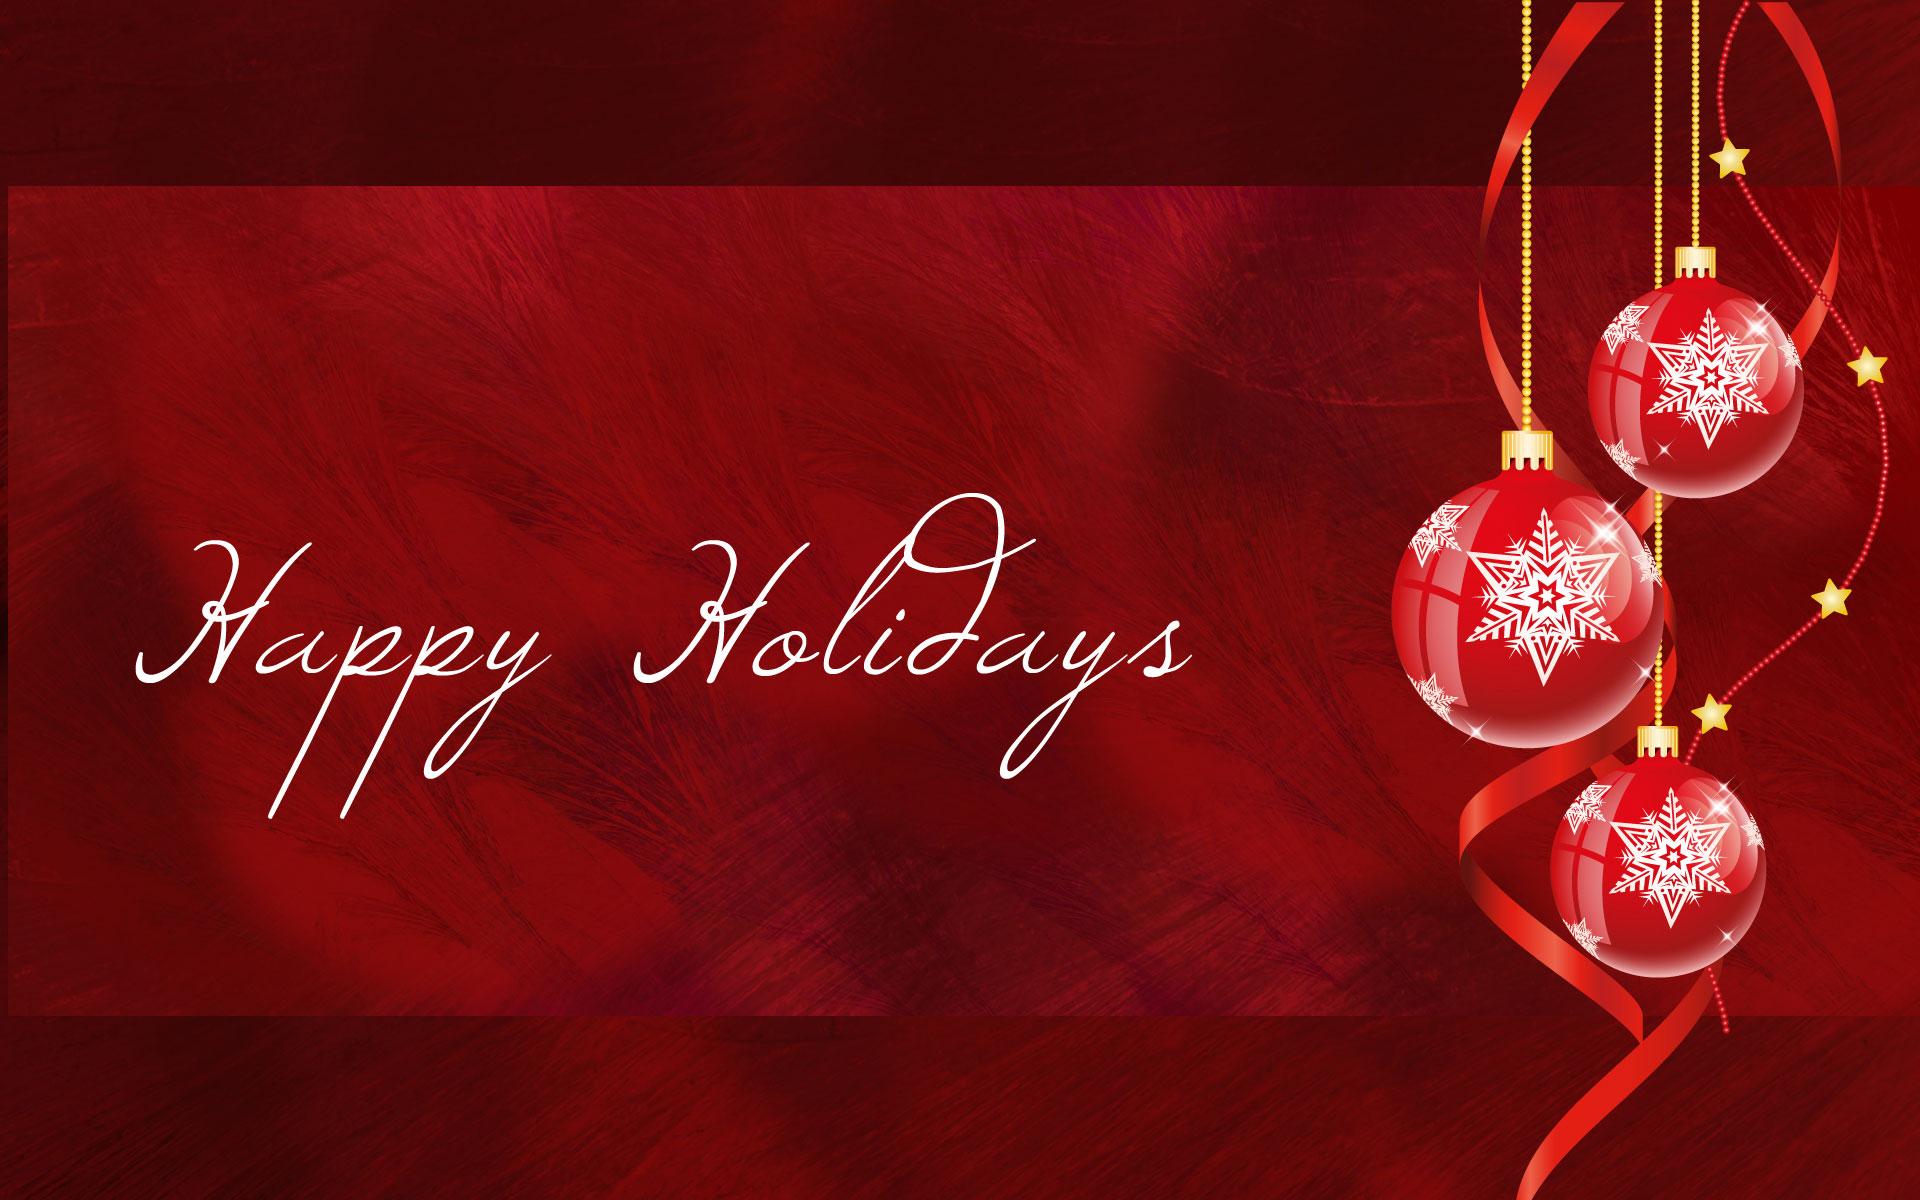 Happy Holidays Wallpapers HD 5Z94D3R WallpapersExpertcom 1920x1200